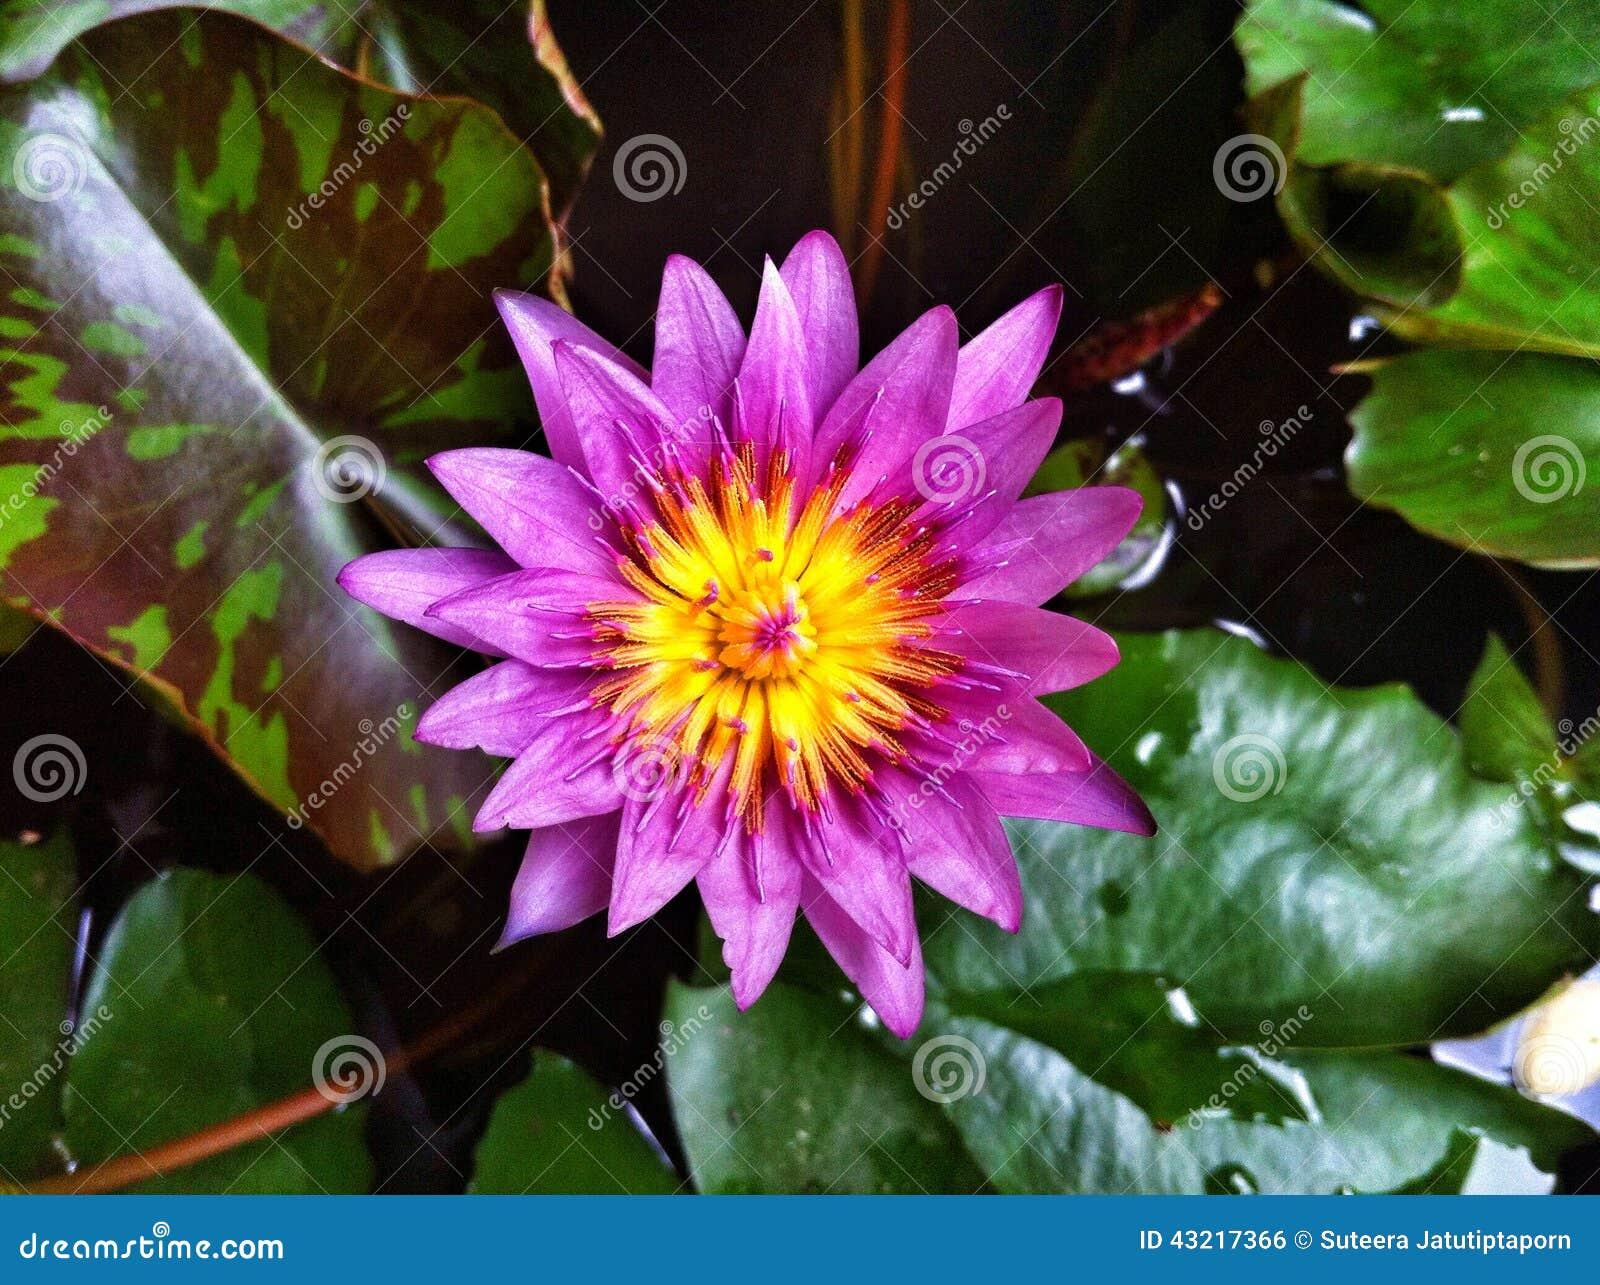 purple lily flower plant - photo #43